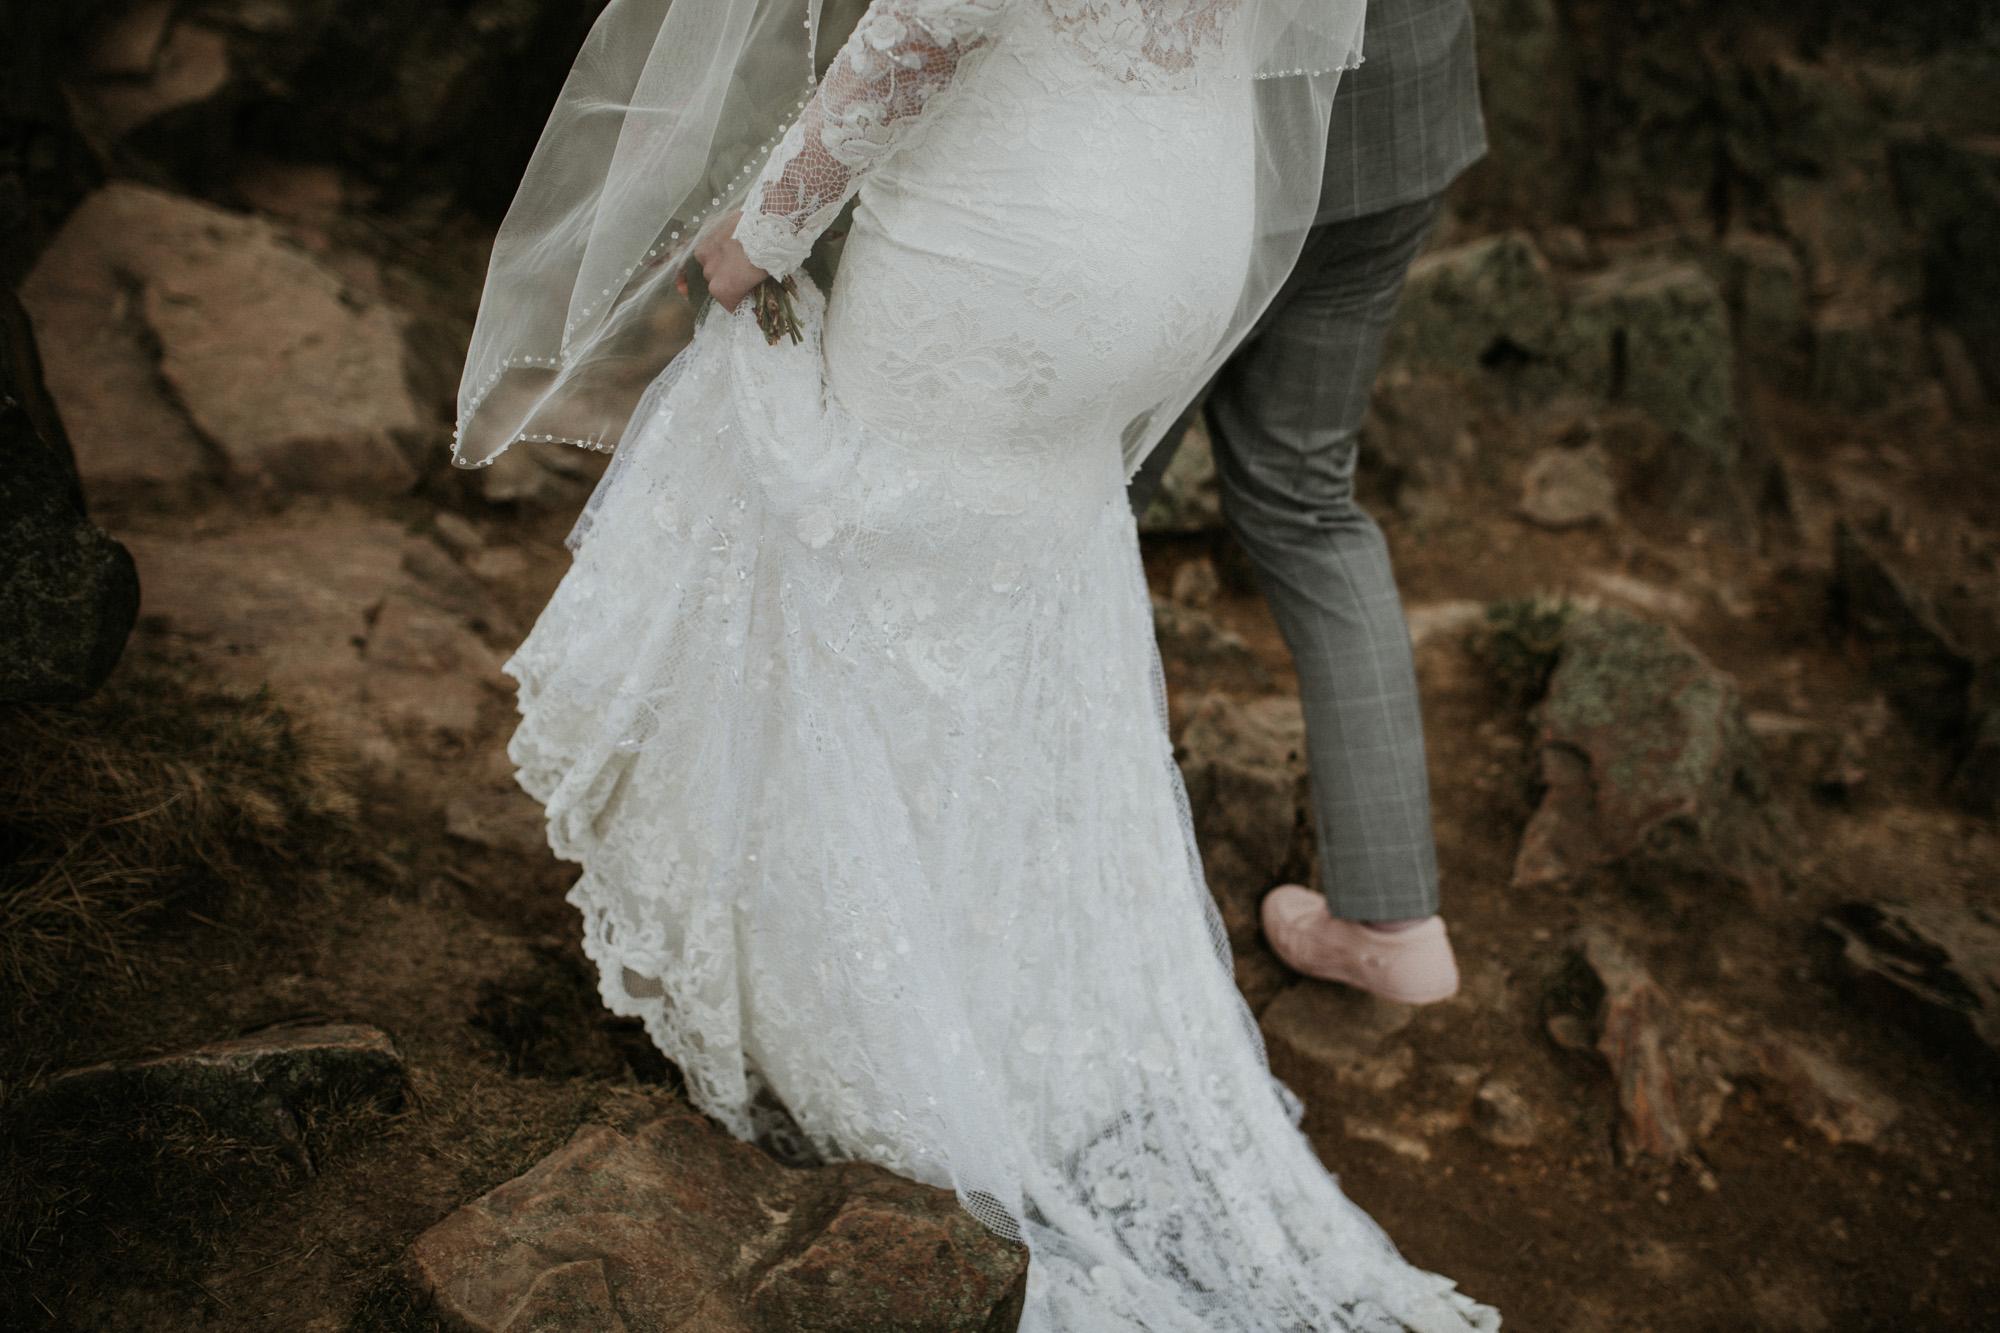 DanielaMarquardtPhotography_Hochzeitsfotograf_Düsseldorf_Köln_Mallorca_Bayern_Austria_Harz_LinaundMaik_Afterwedding-Shooting_Weddingphotographer_Ibiza_Tuskany_Italien_Toskana7